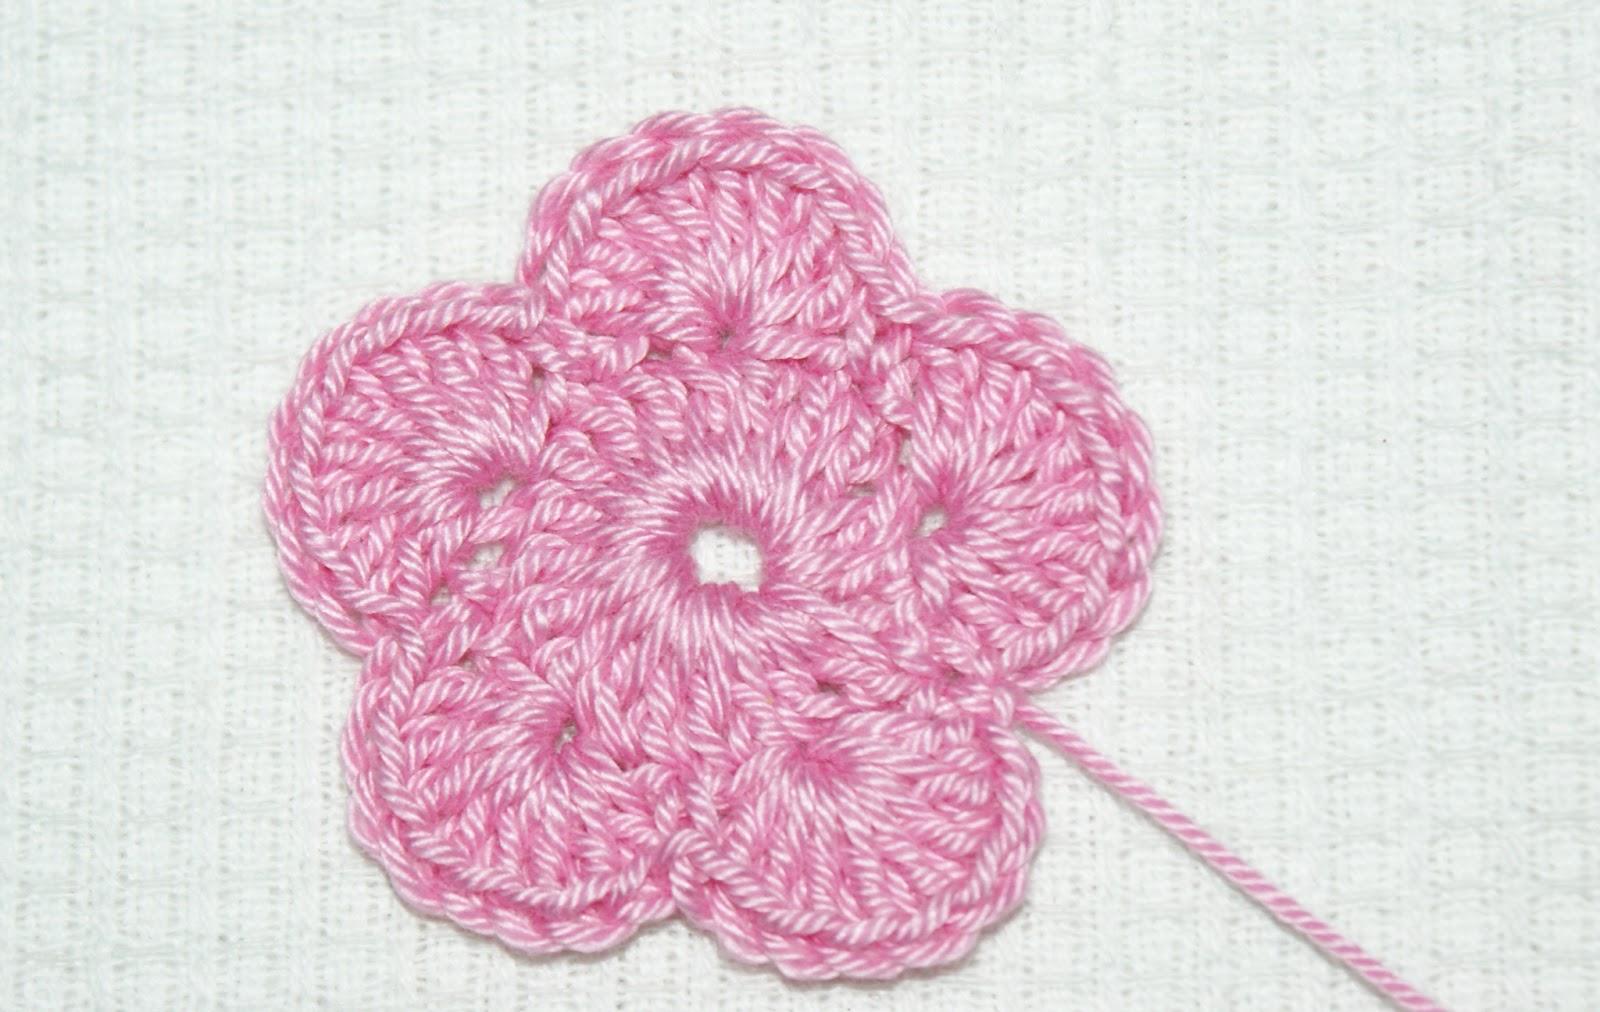 crochet magic for all: Day 16-18 Five petal, fluffy flower ...